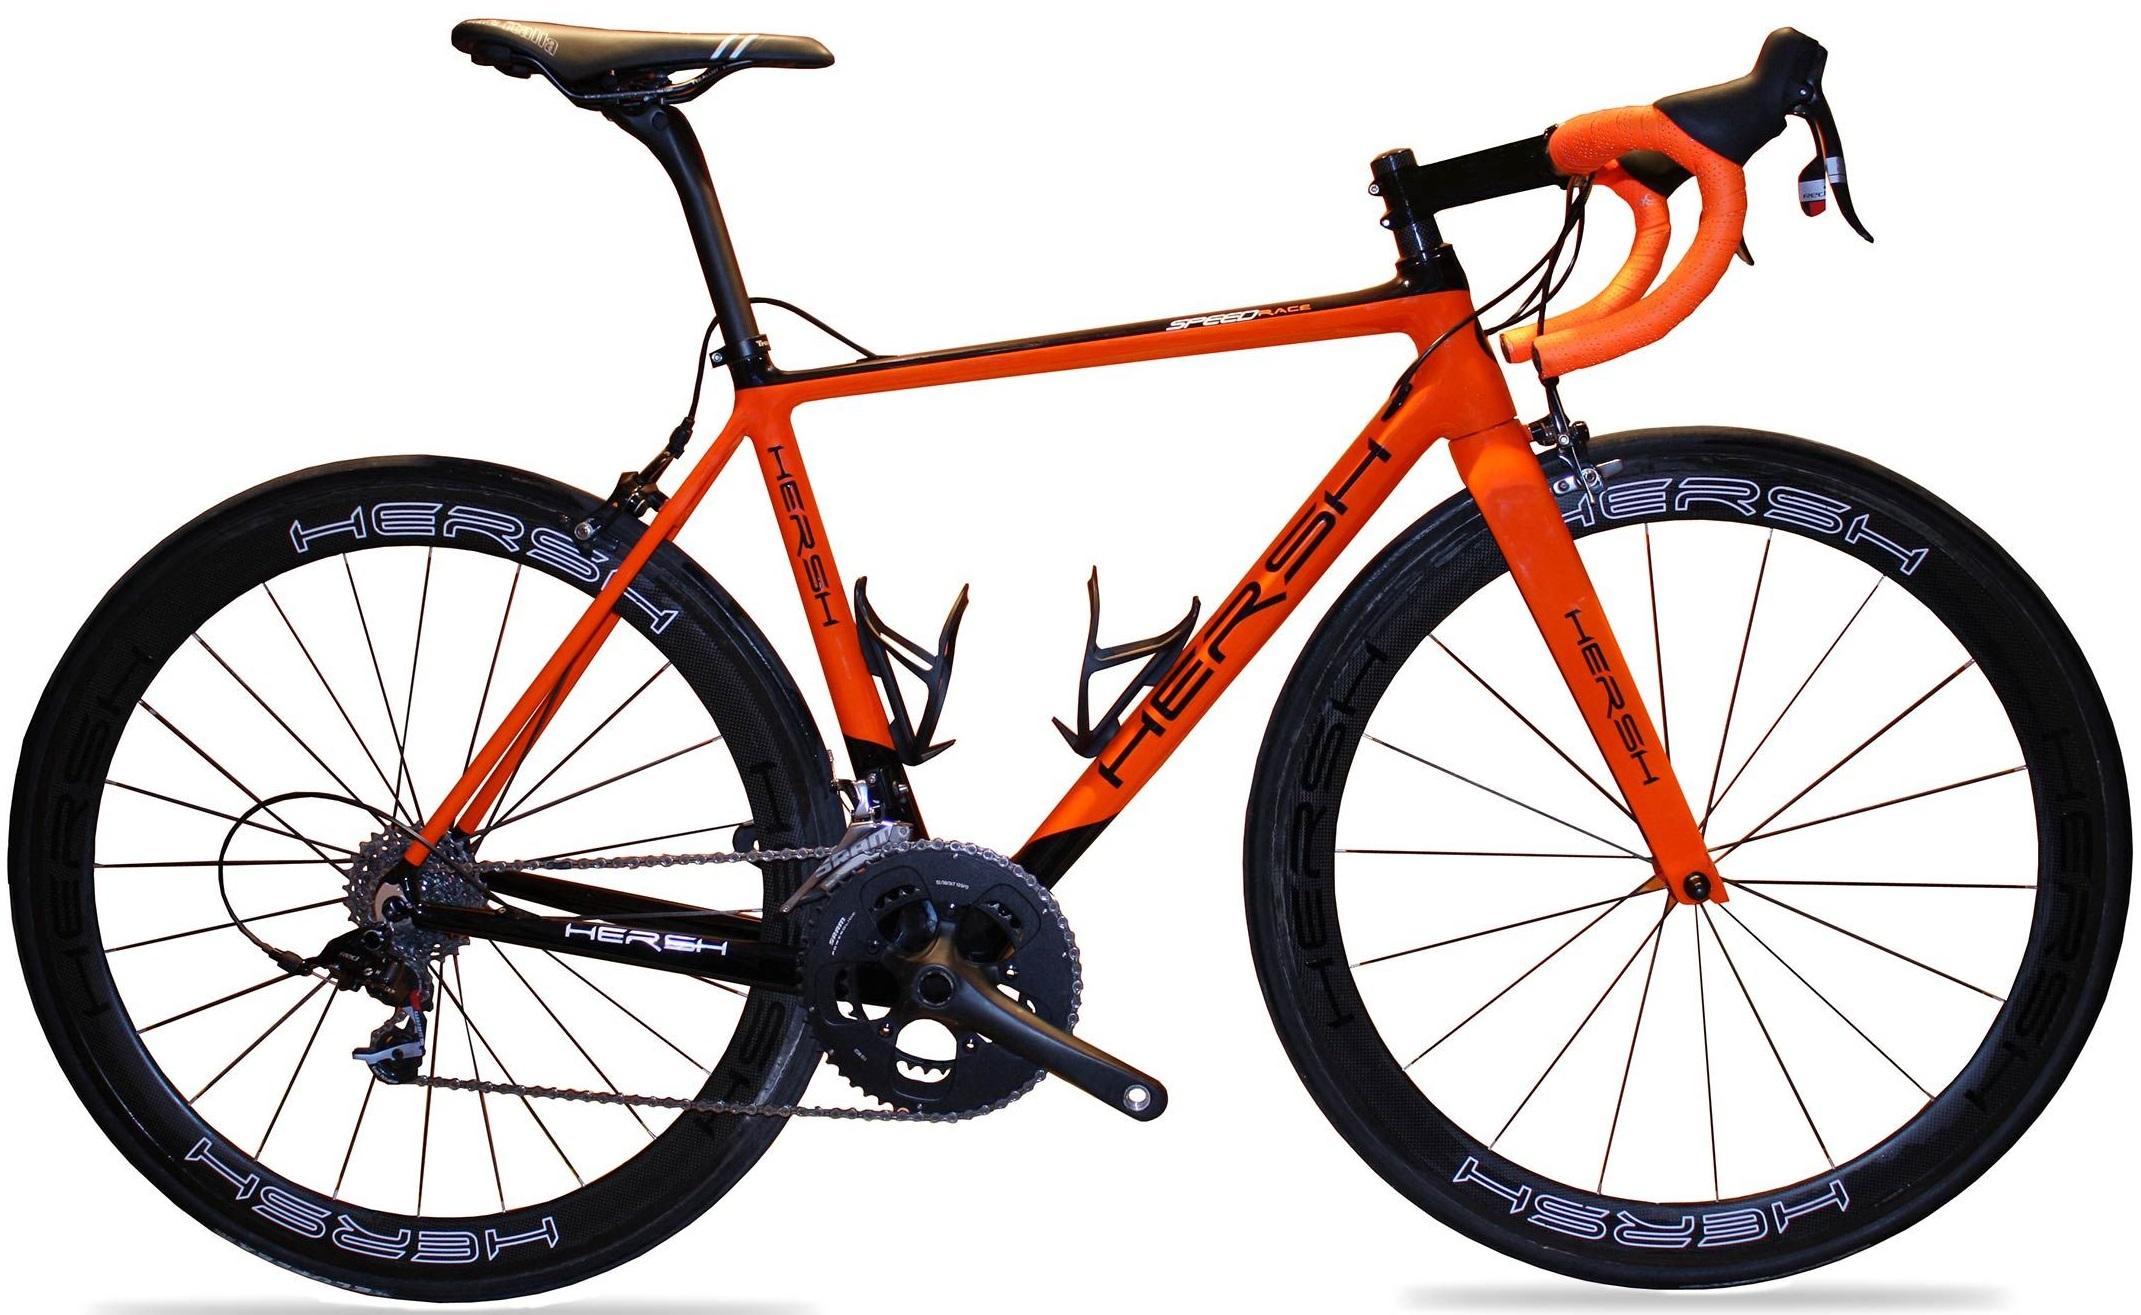 2016 Hersh Speed orangeneuroticarnutz2016 Hersh Speed orange2016 LOW MKi enve orange sram red